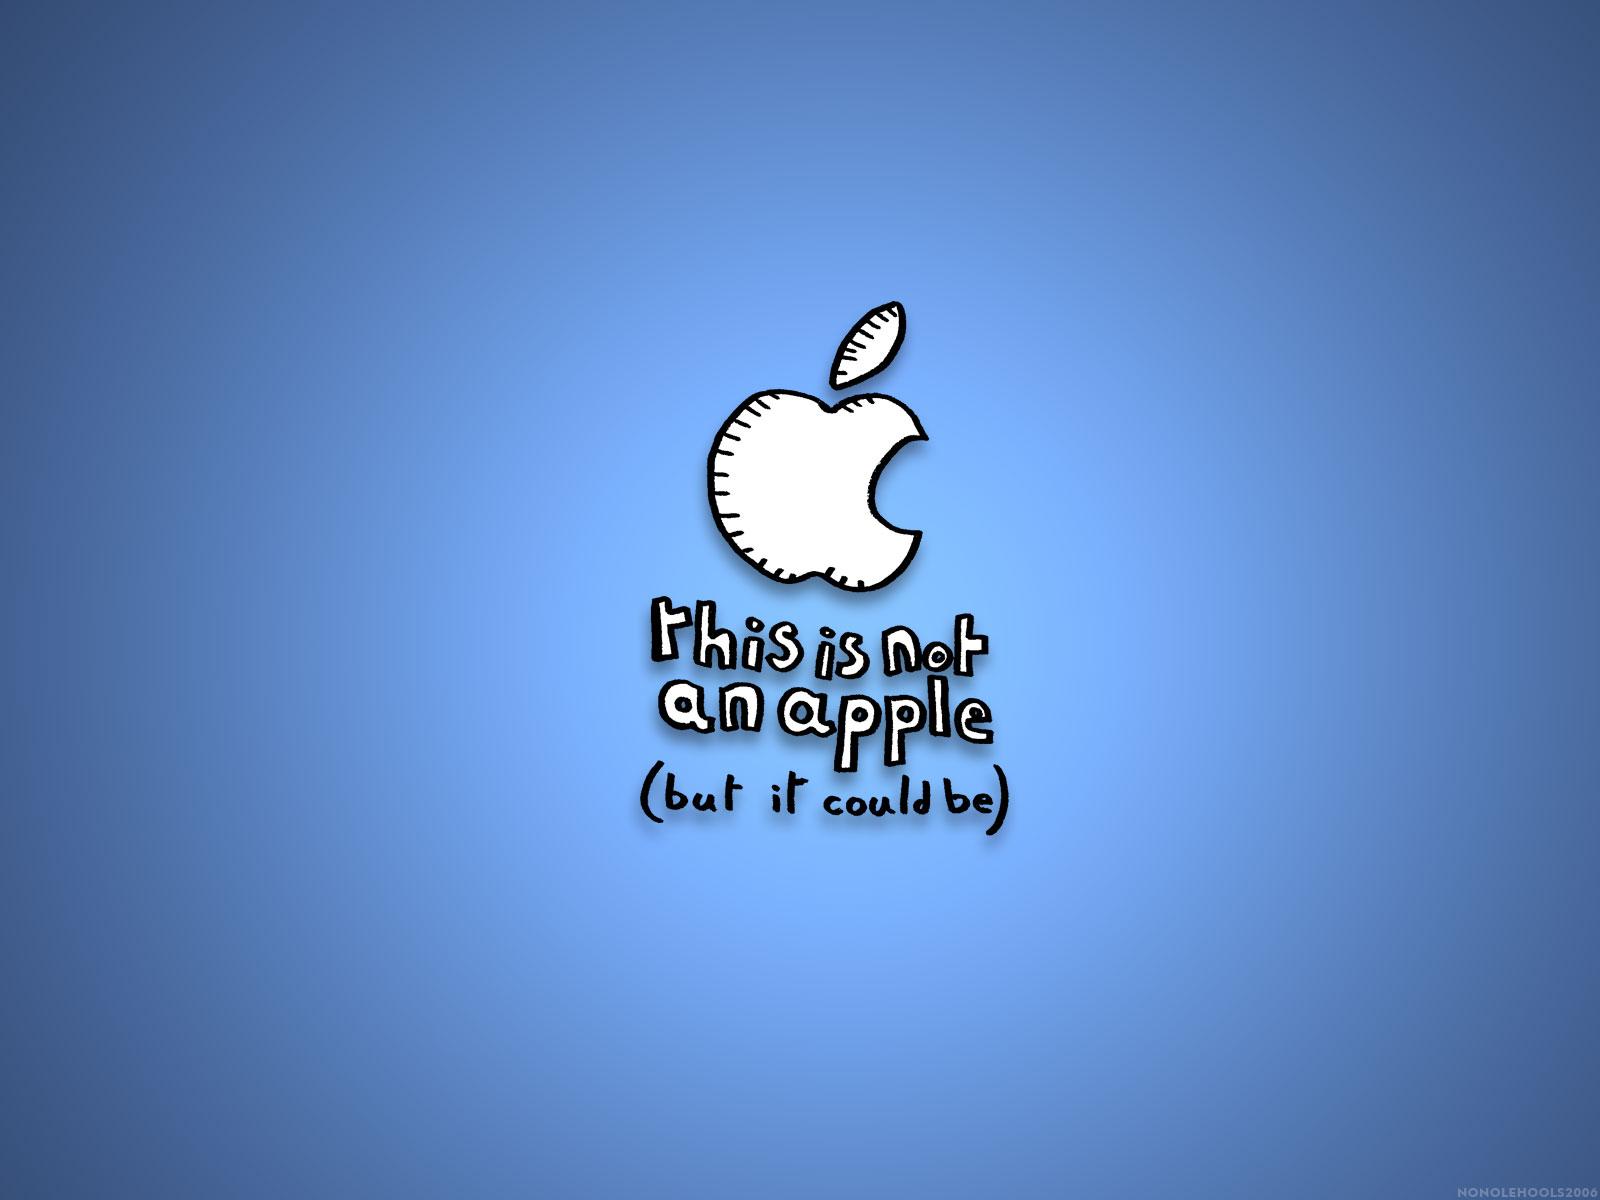 http://3.bp.blogspot.com/_4zTzx8QBOi8/TK8cCzjq5qI/AAAAAAAACms/4rr6Yx0lz8s/s1600/rhisis-not-an-apple-wallpapers_1600x1200-795175.jpg